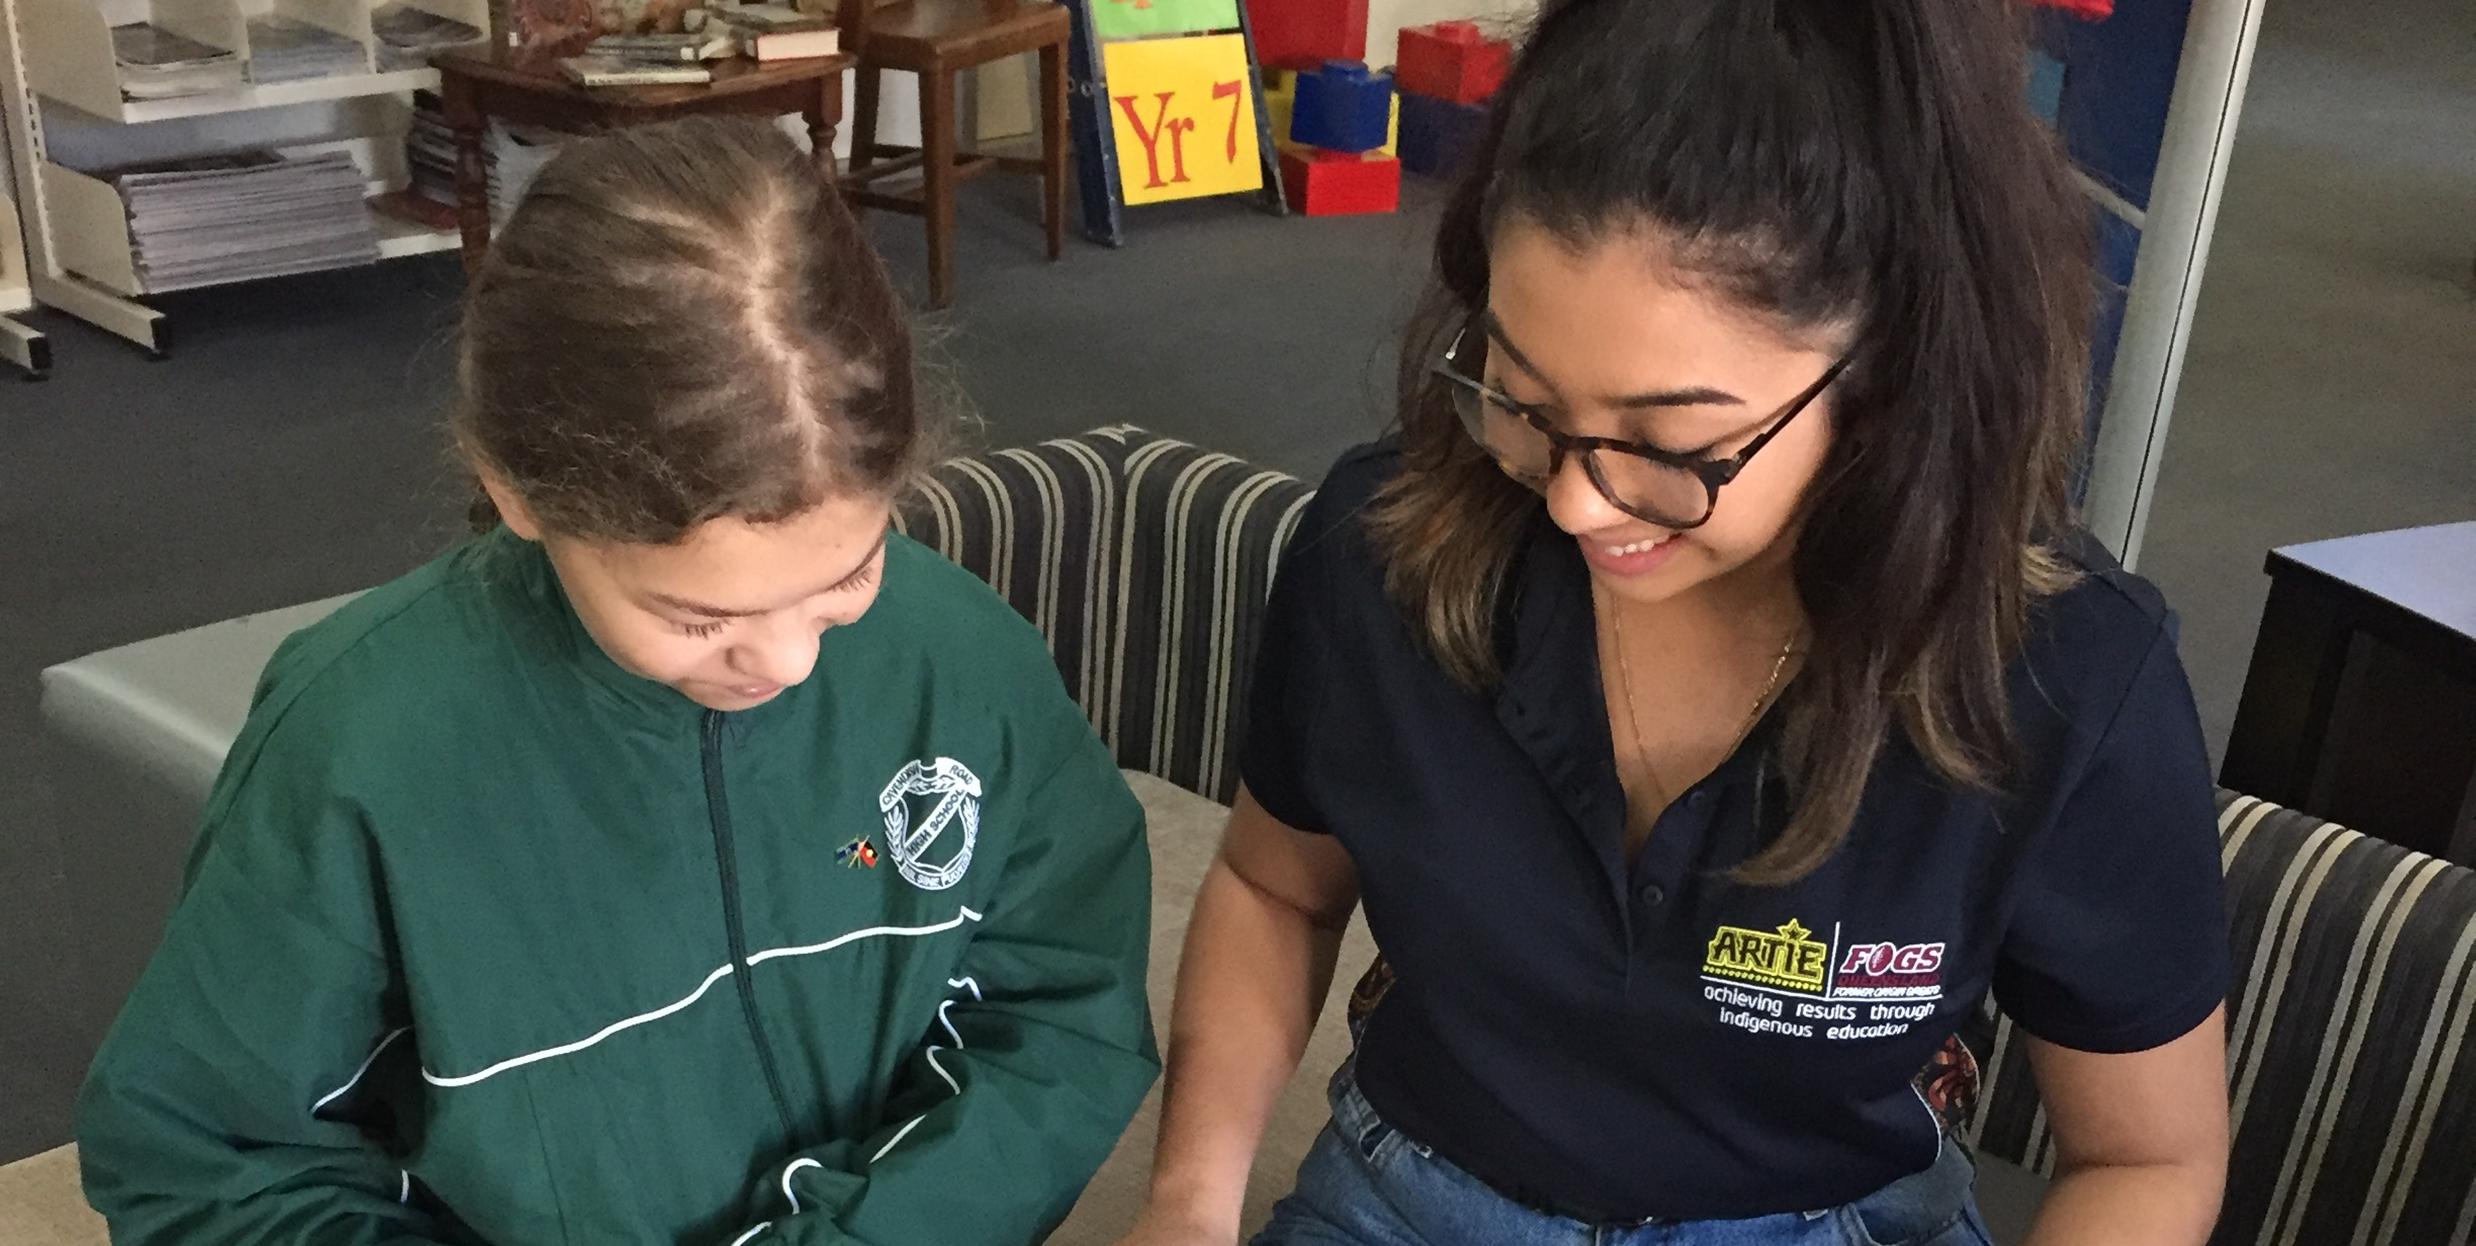 ARTIE ACADEMY HELPS TAFE STUDENTS LEARN TO TEACH